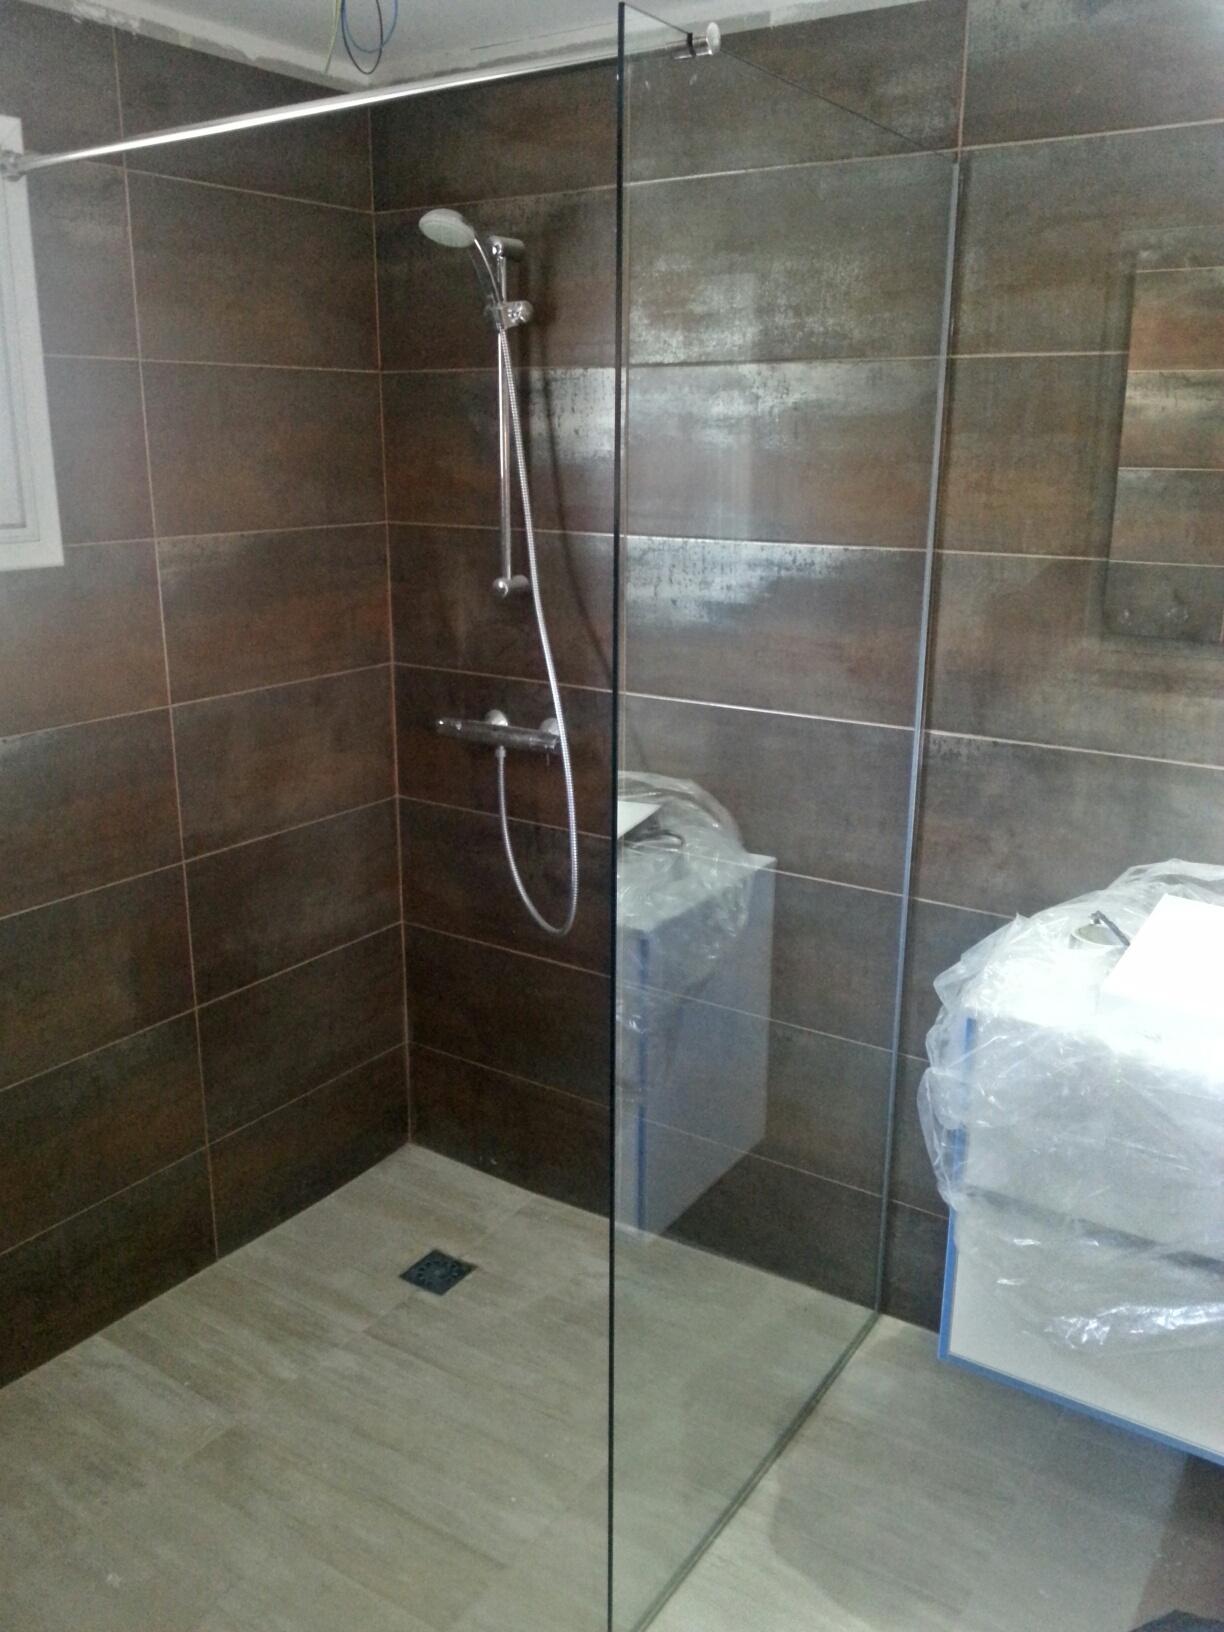 Mamparas Para Baño De Acero Inoxidable:Perfiles Mamparas De Vidrio Para Banos